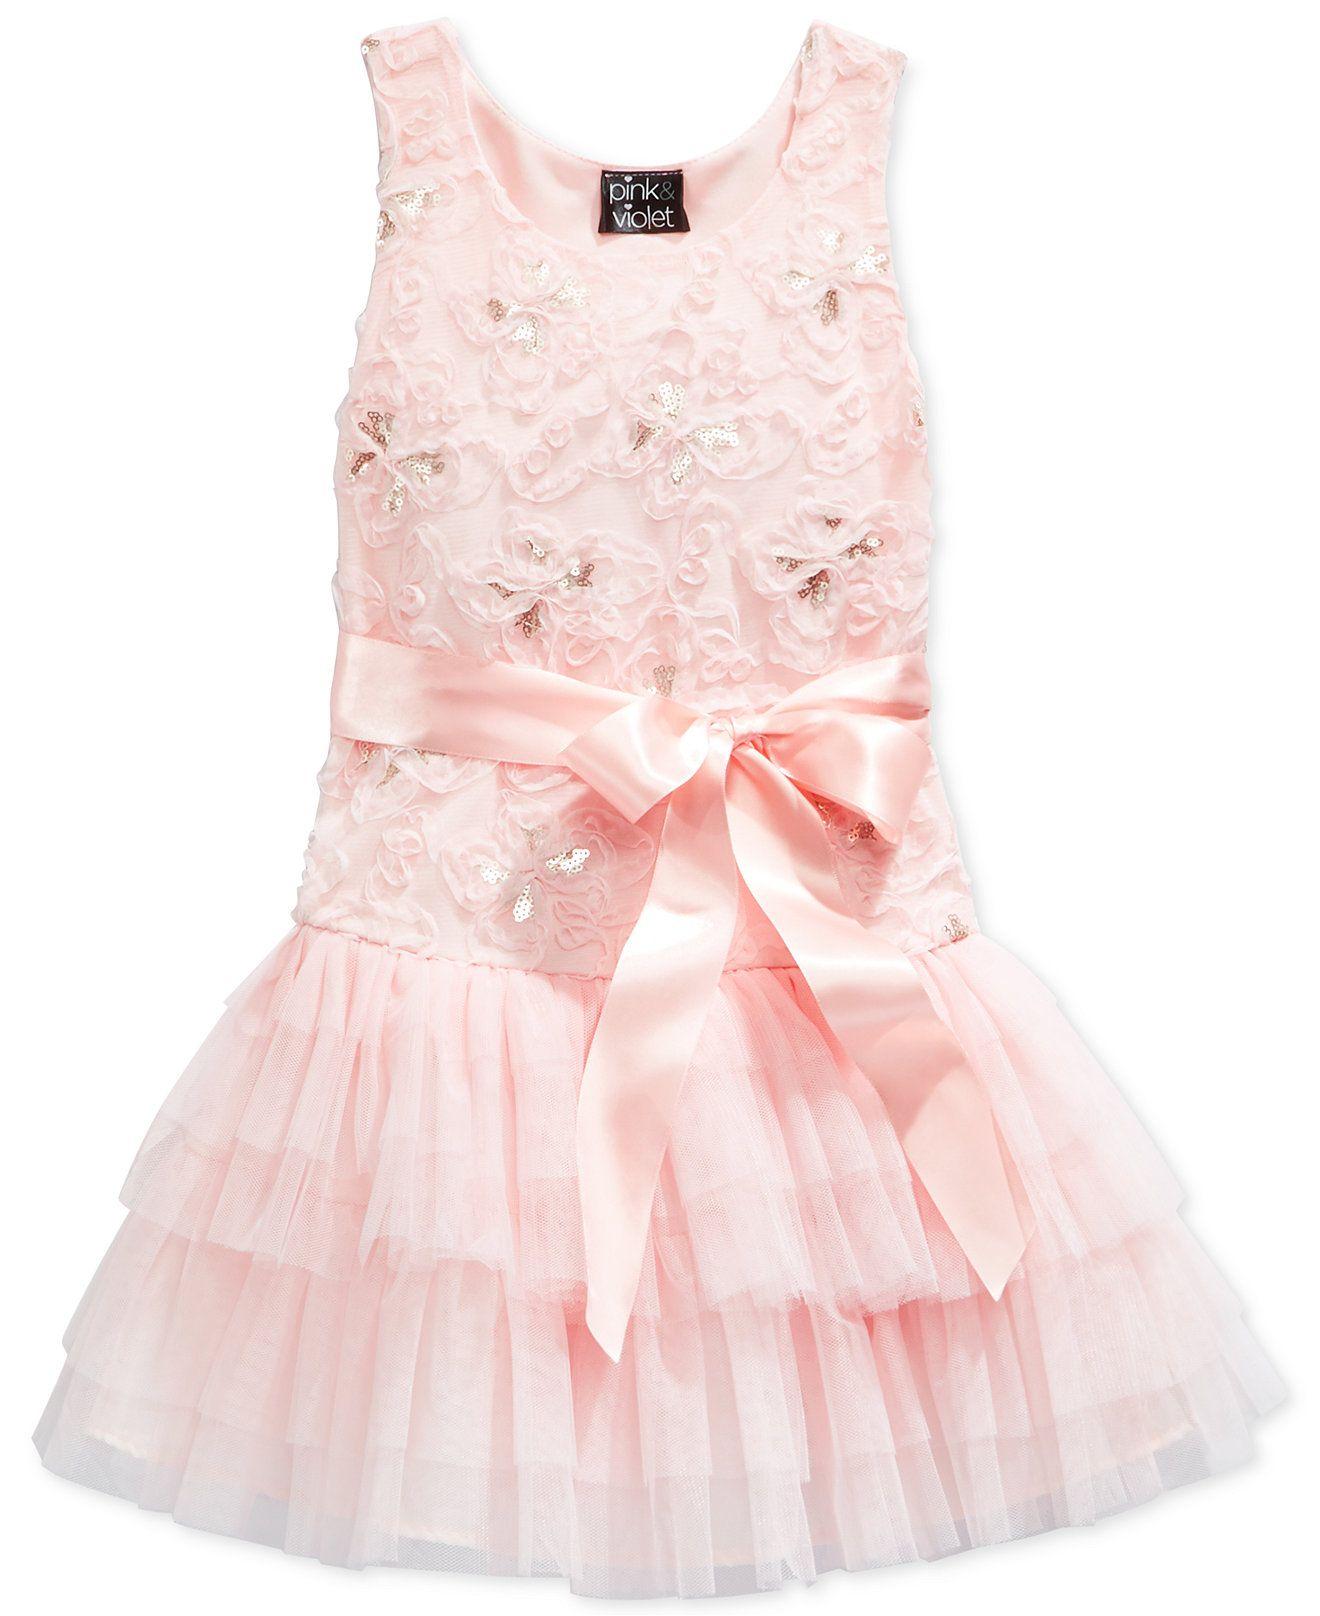 ea23abd76de Pink   Violet Little Girls  Butterfly Soutache Dress - Girls 2-6X - Kids    Baby - Macy s